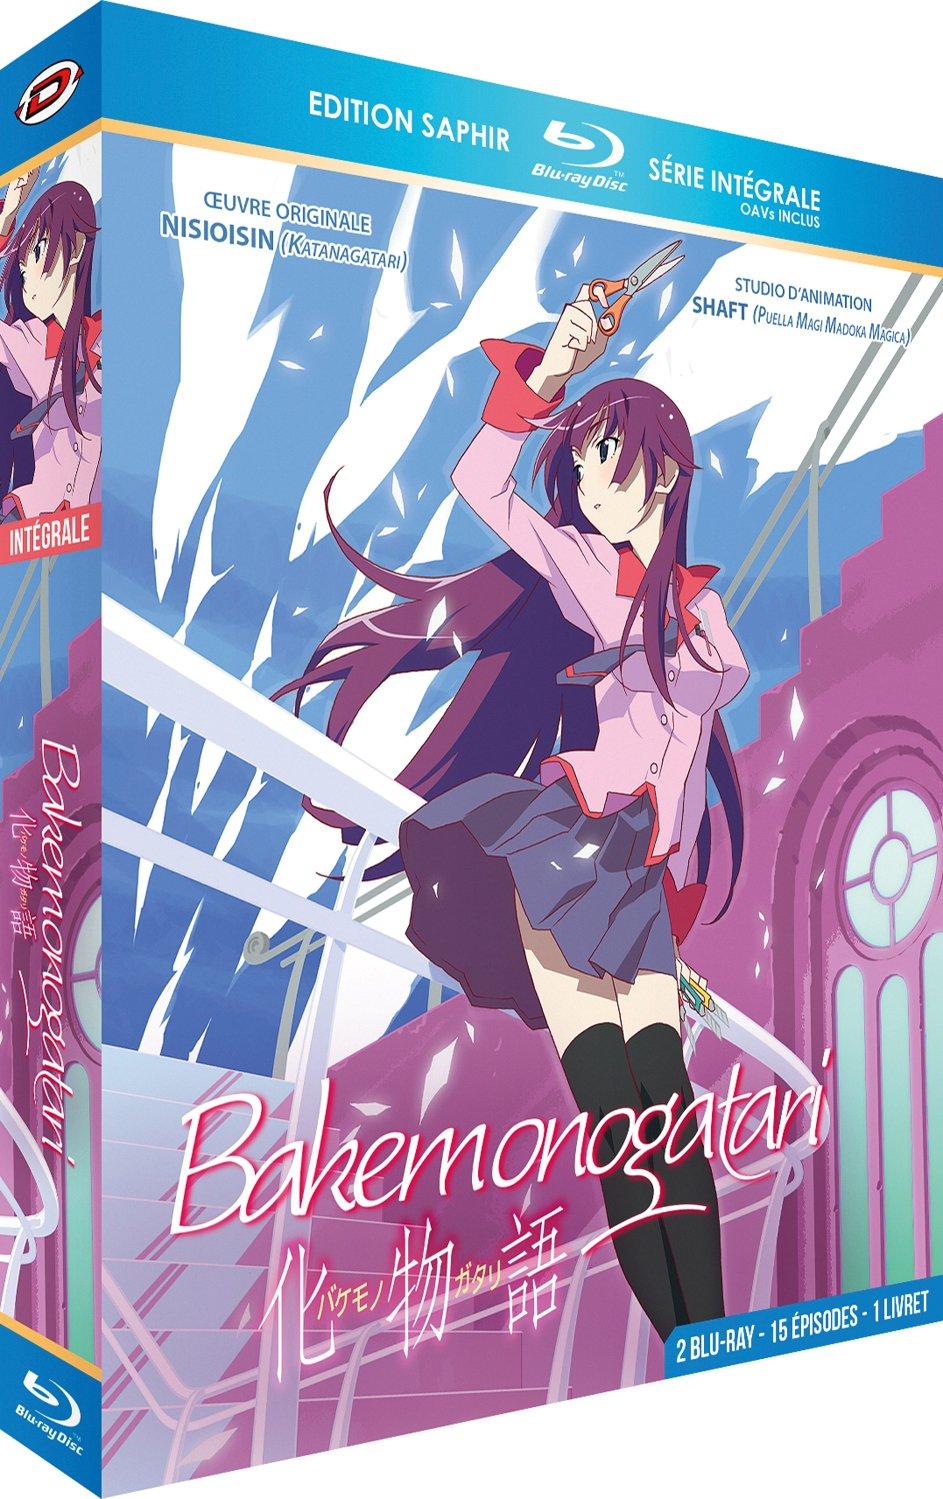 Bakemonogatari-bluRay